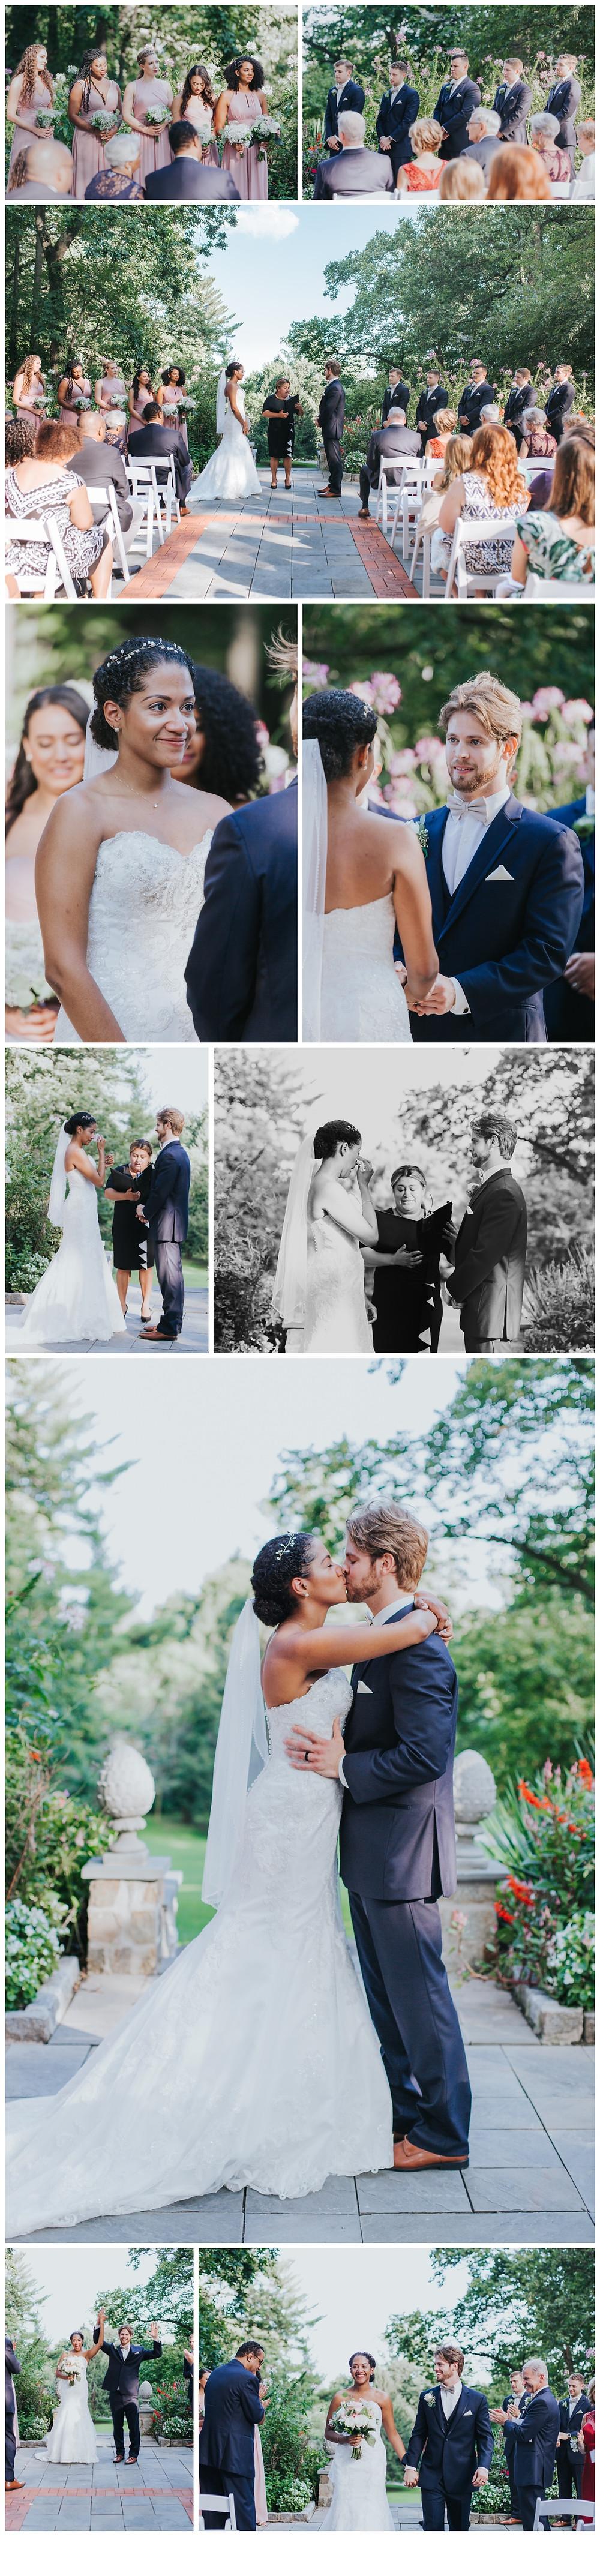 Garden wedding ceremony at Gramercy Mansion by Katherine Elizabeth Photography